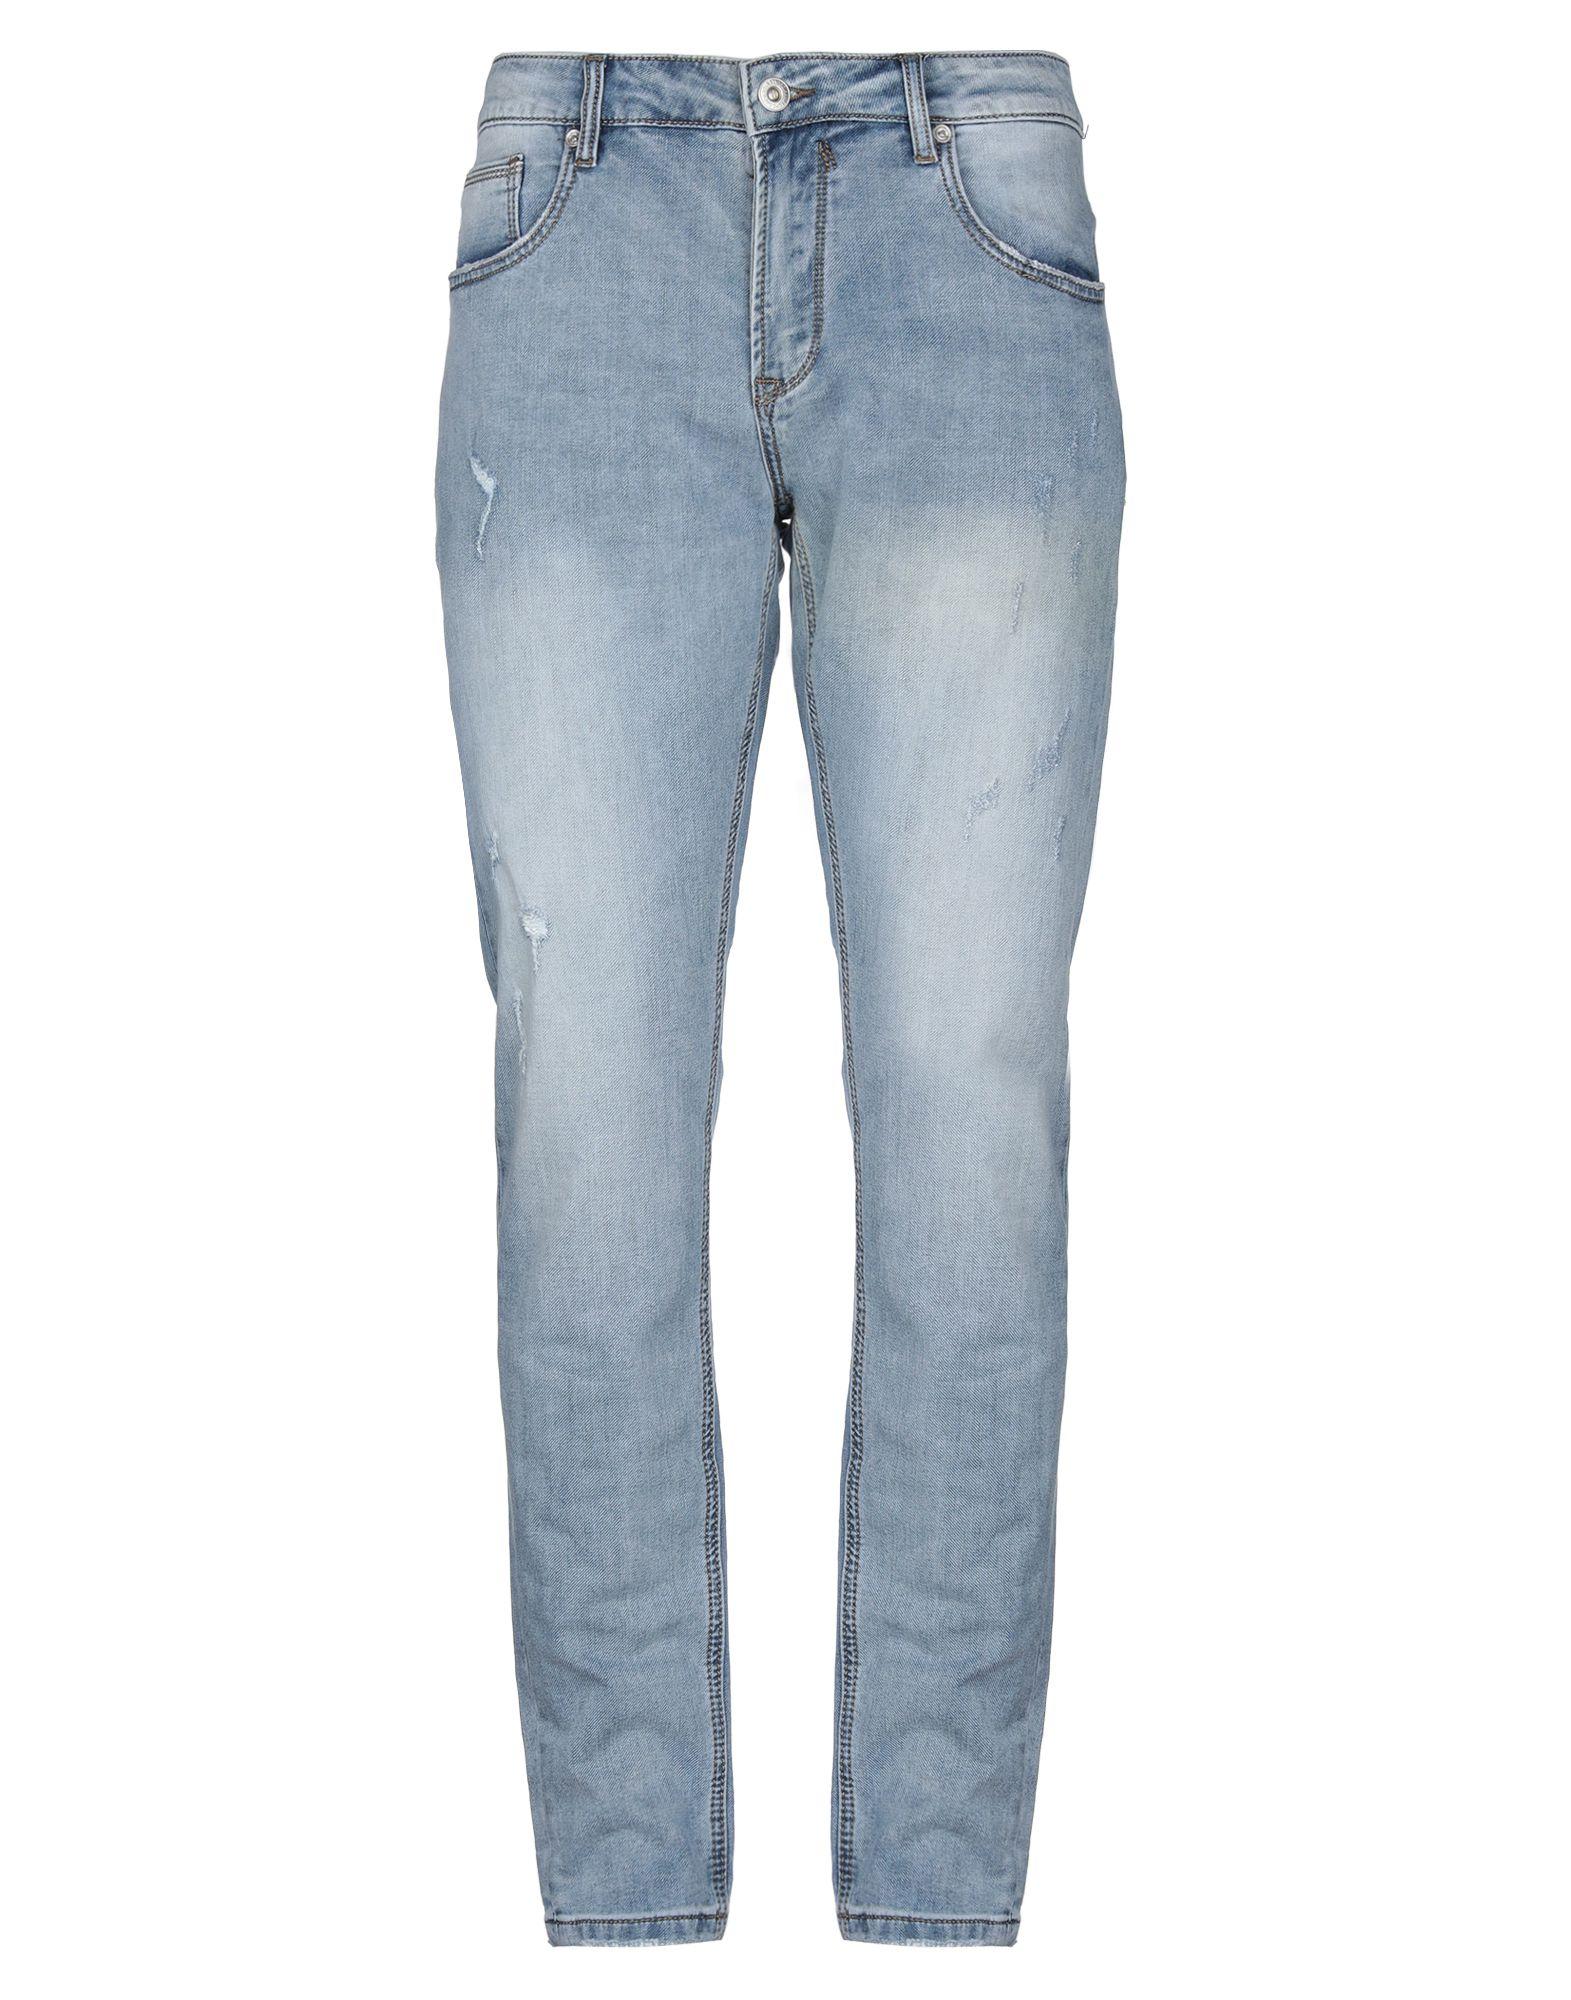 GIANNI LUPO Джинсовые брюки